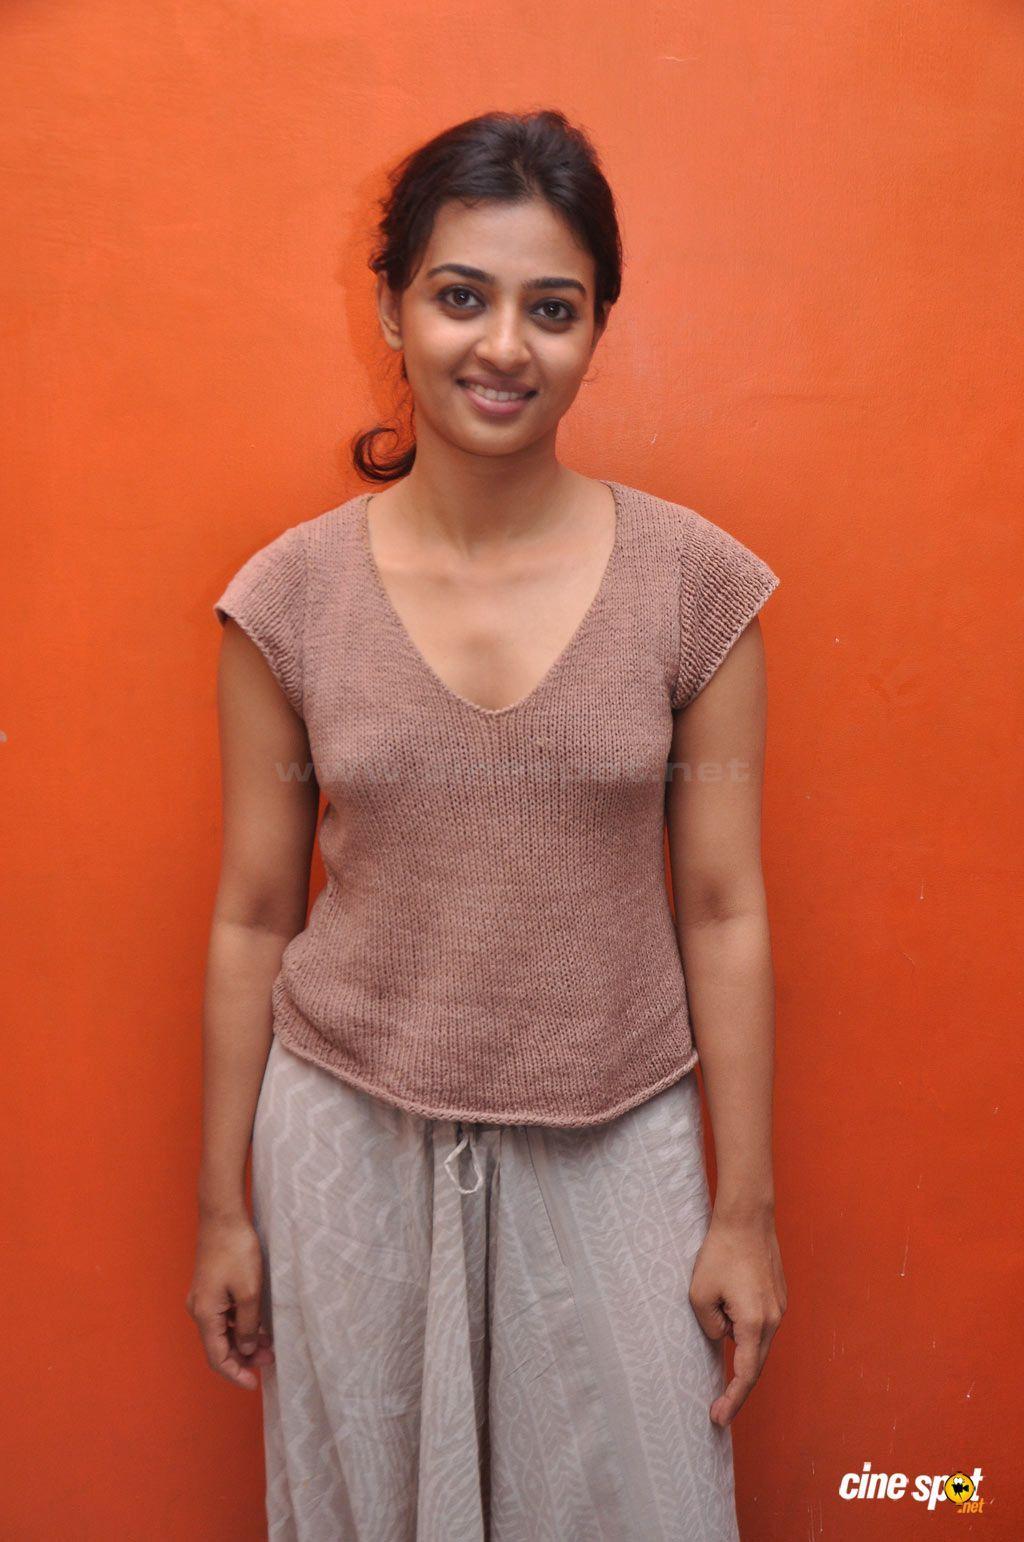 radhika apte wiki